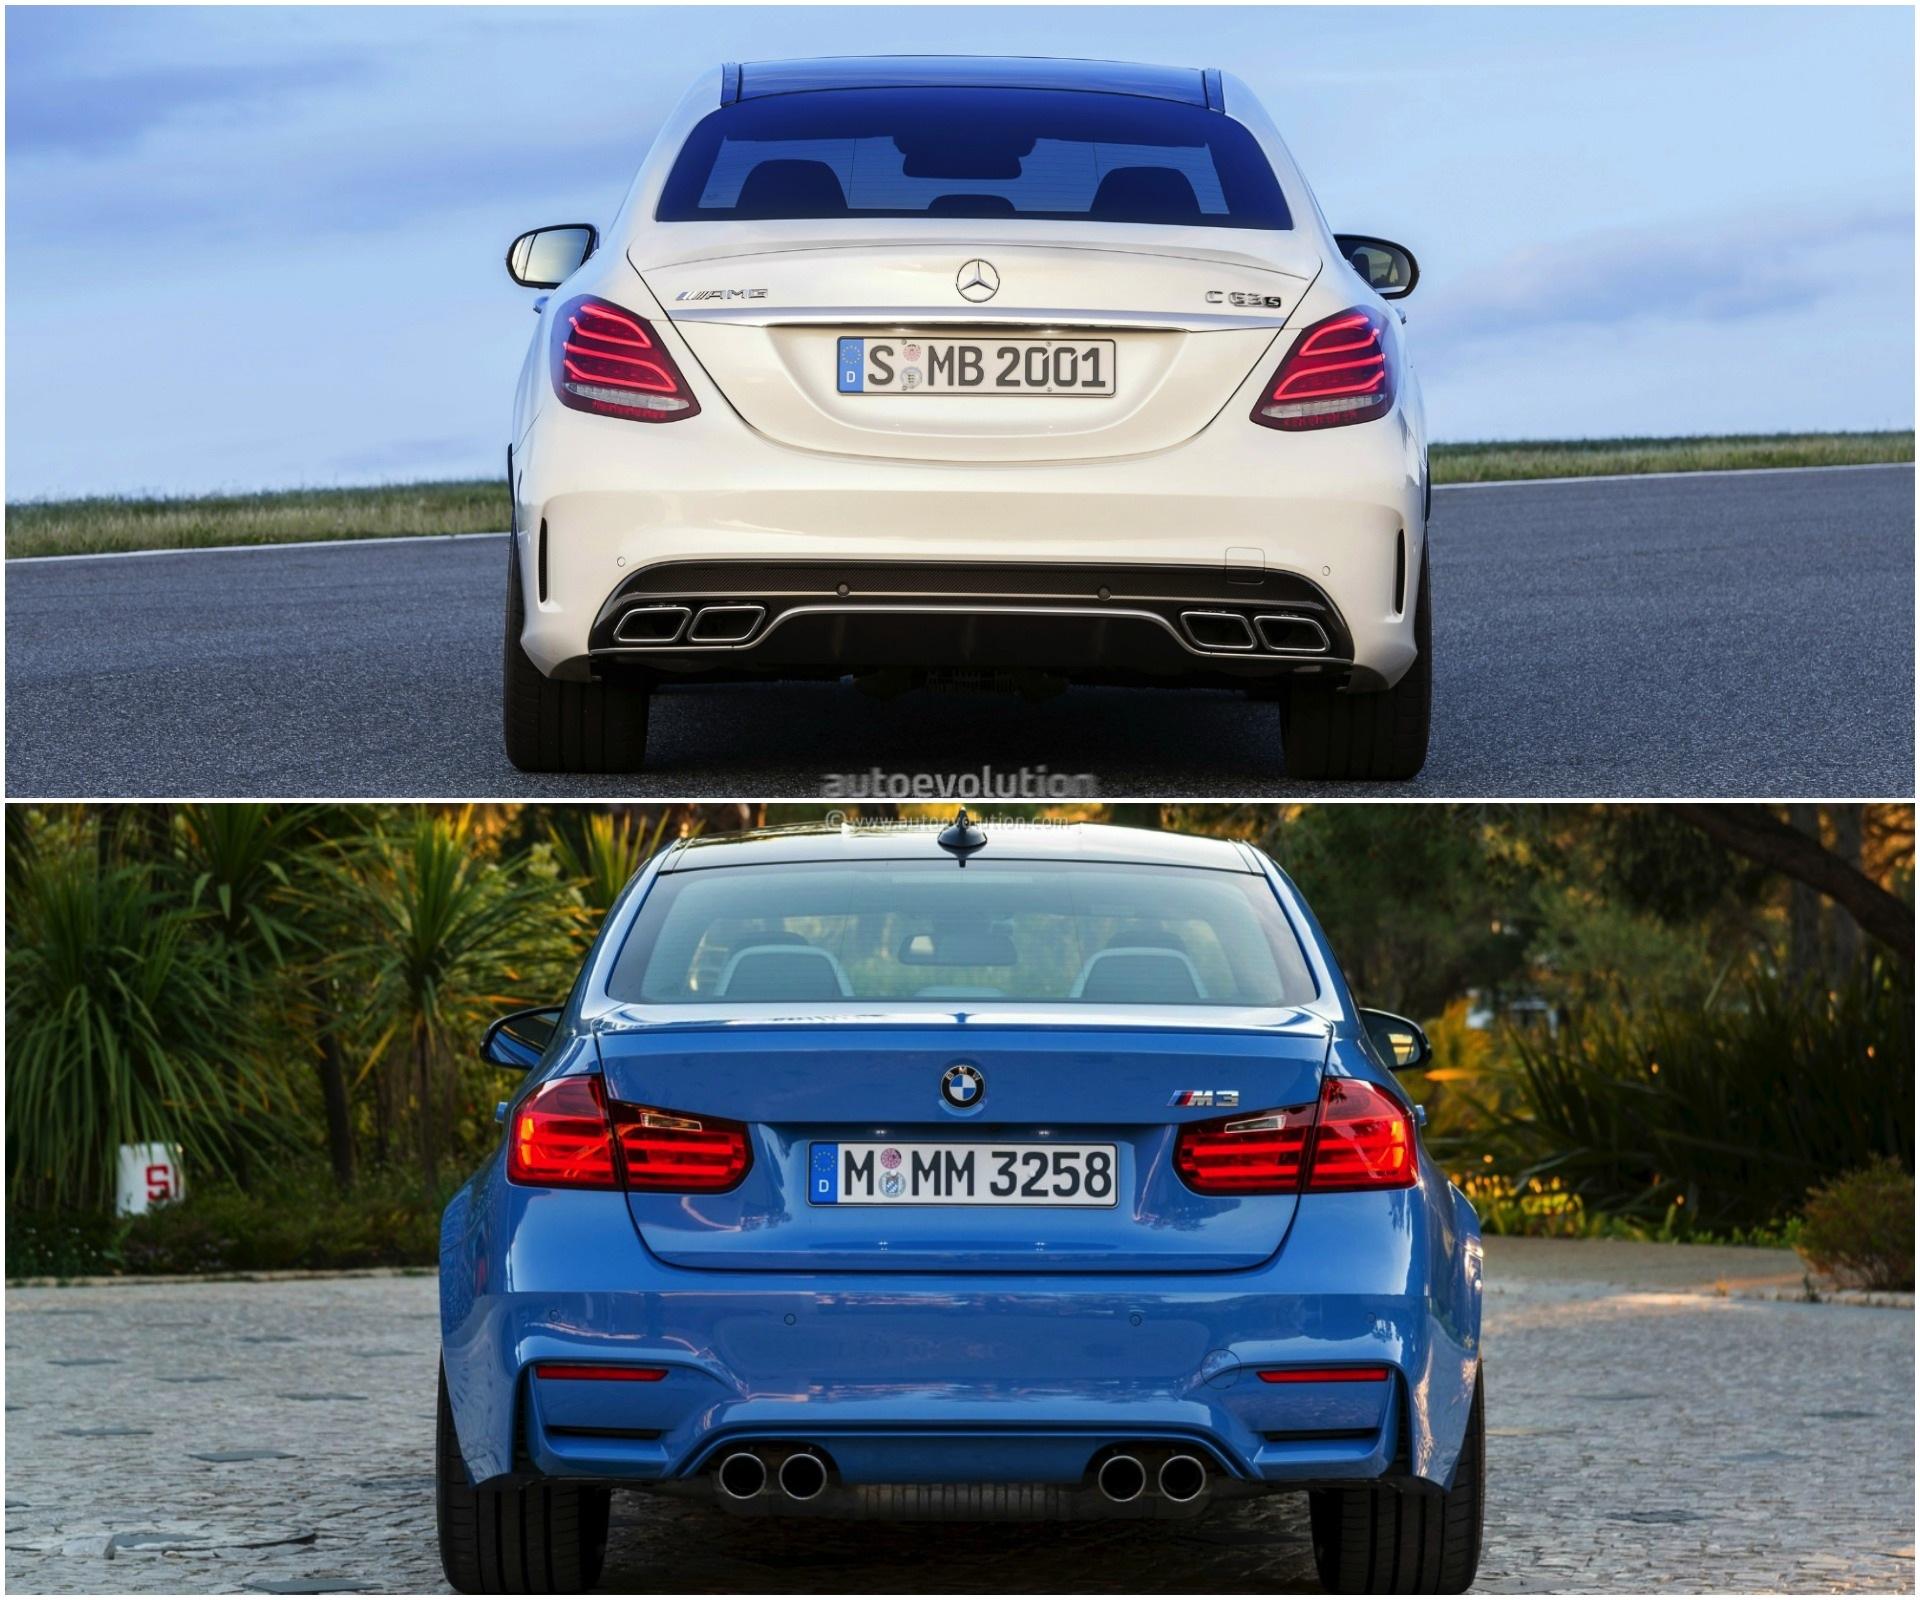 BMW F80 M3 Vs Mercedes-AMG C 63: Sports Saloon Comparison